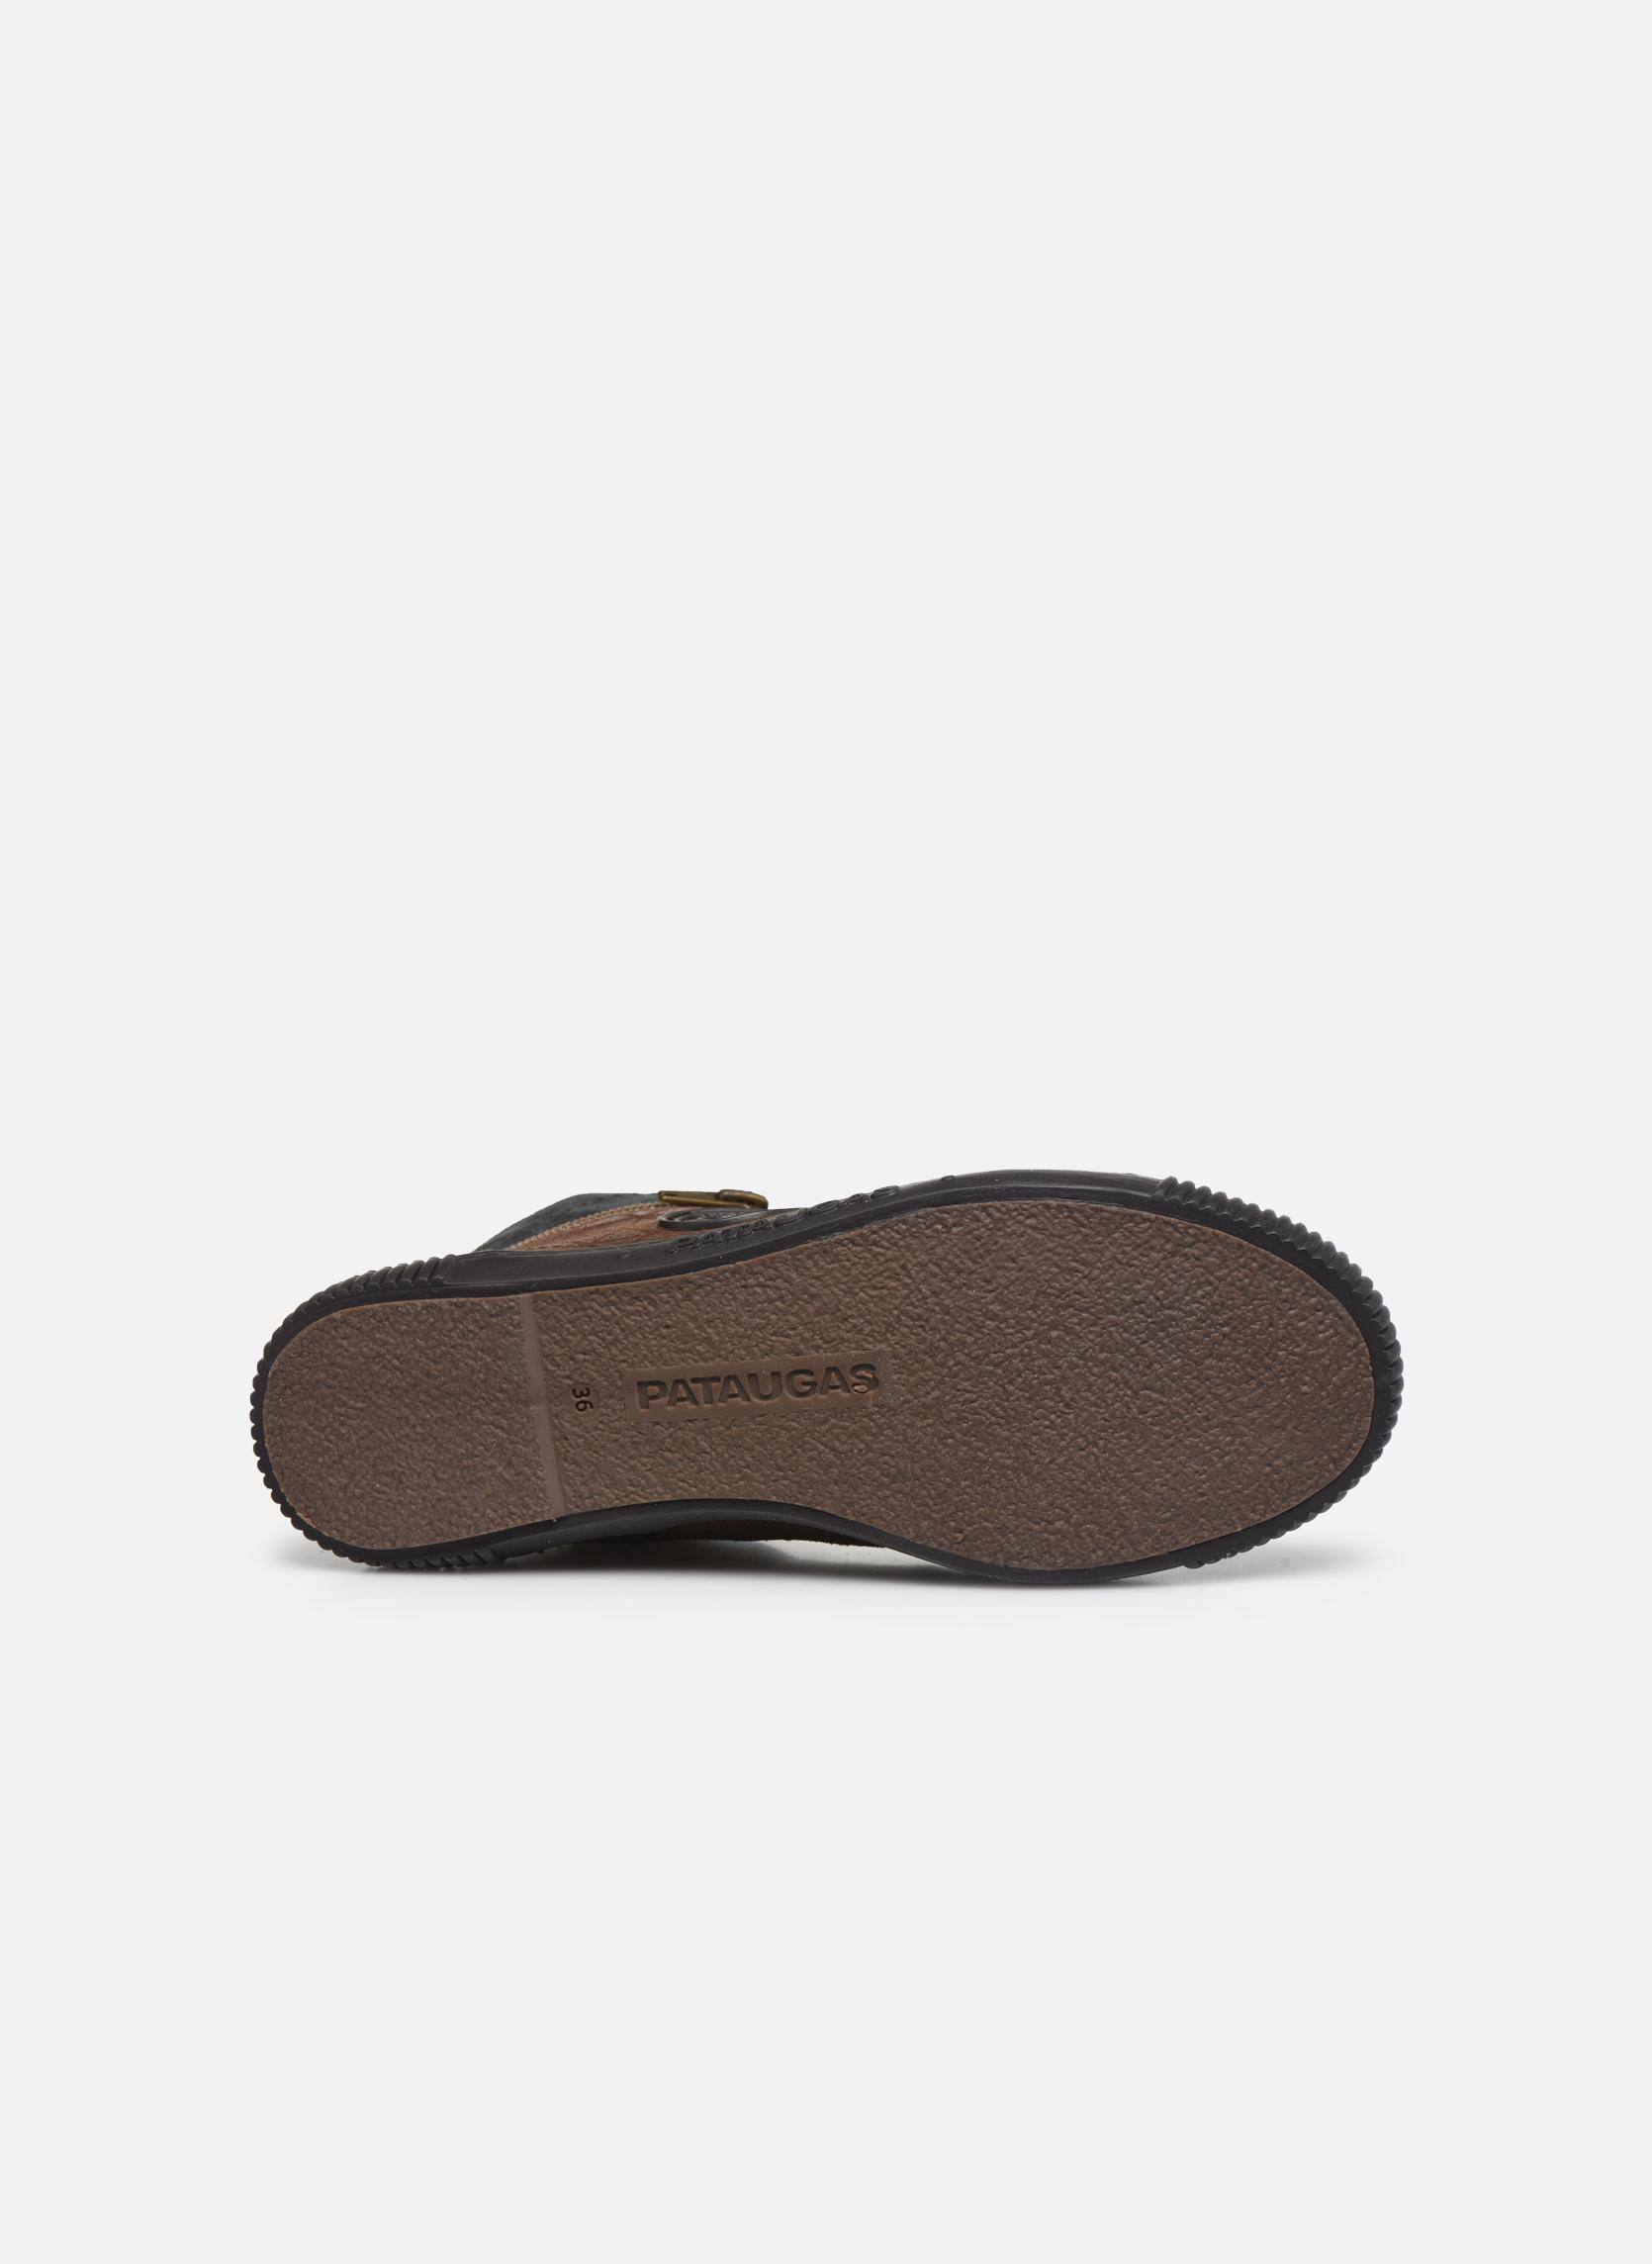 Banjou marron